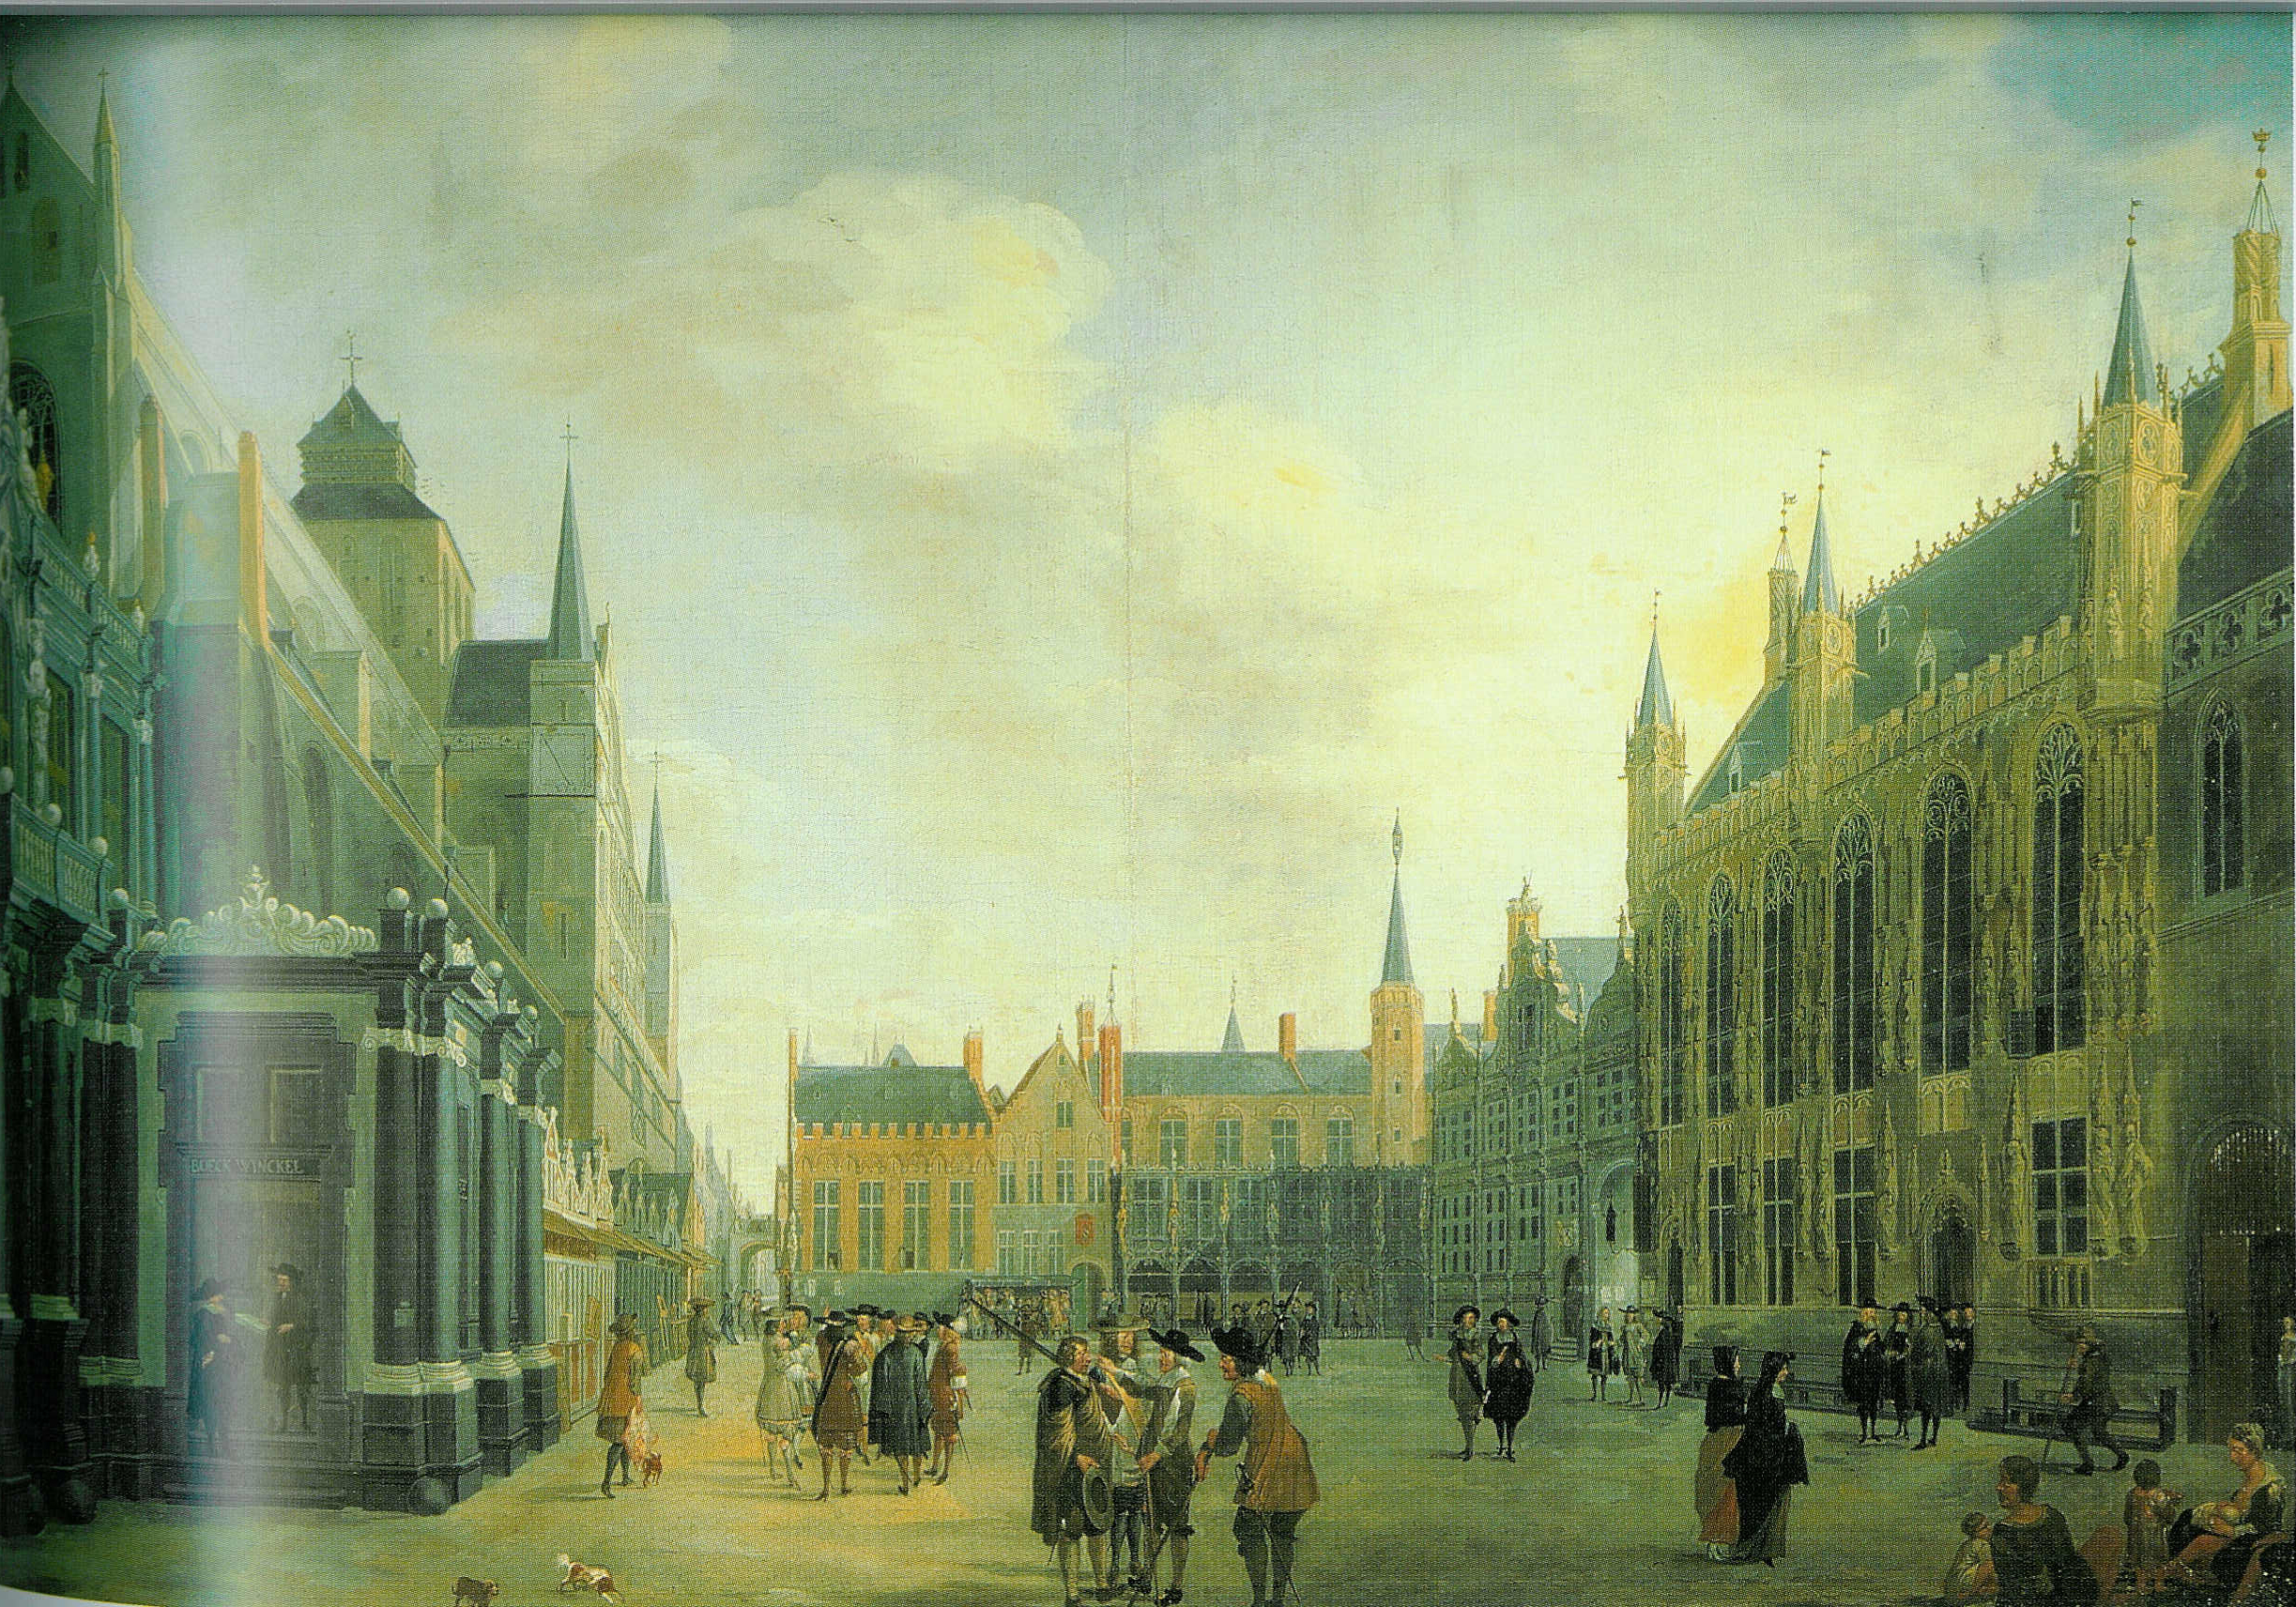 Burg_in_Brugge_-_Belgi%C3%AB.jpg